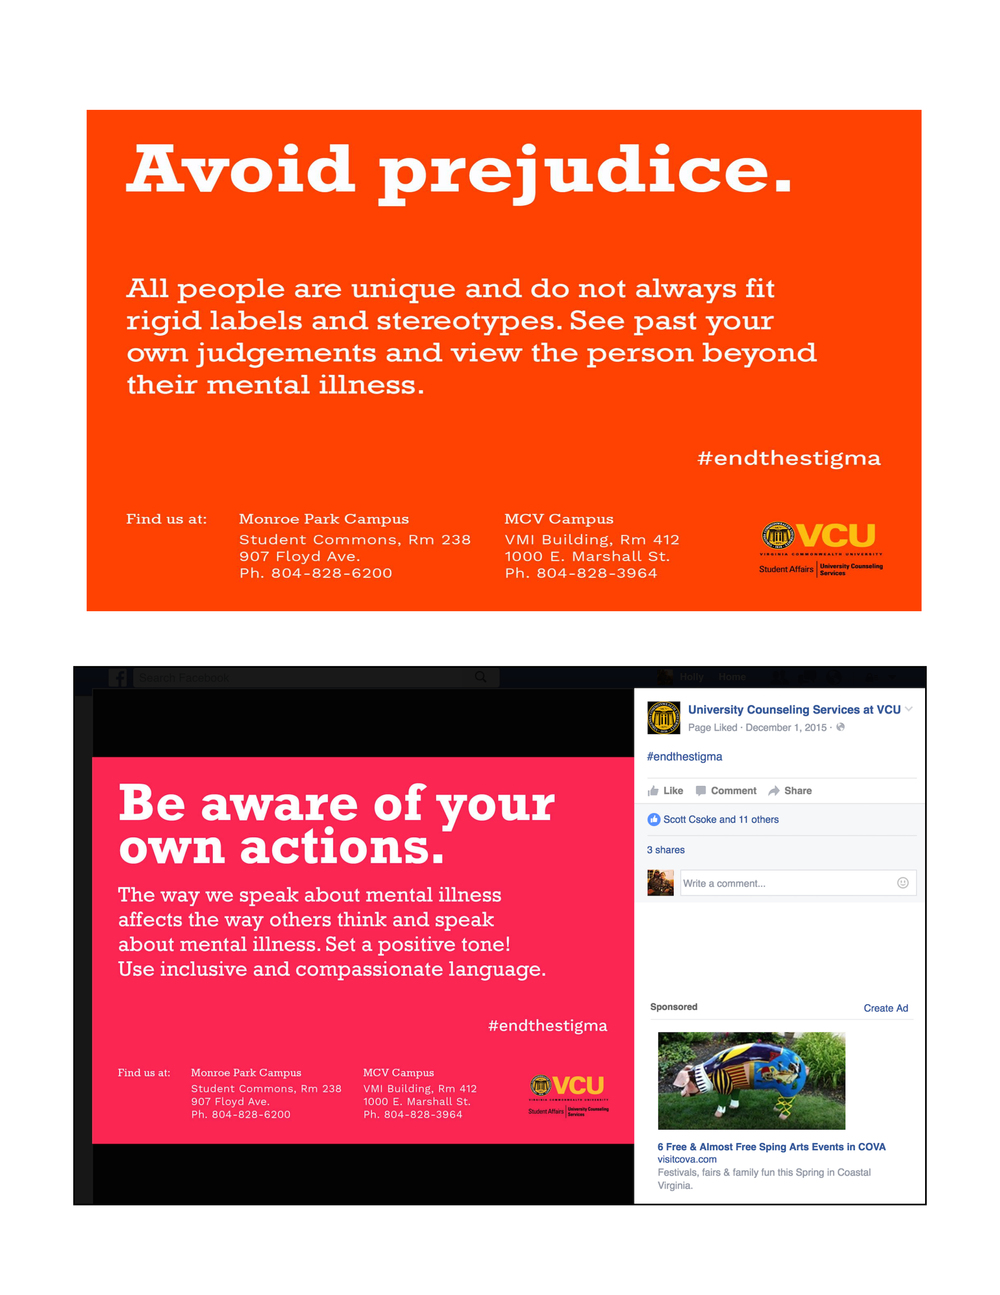 VCU university services twitter campaign